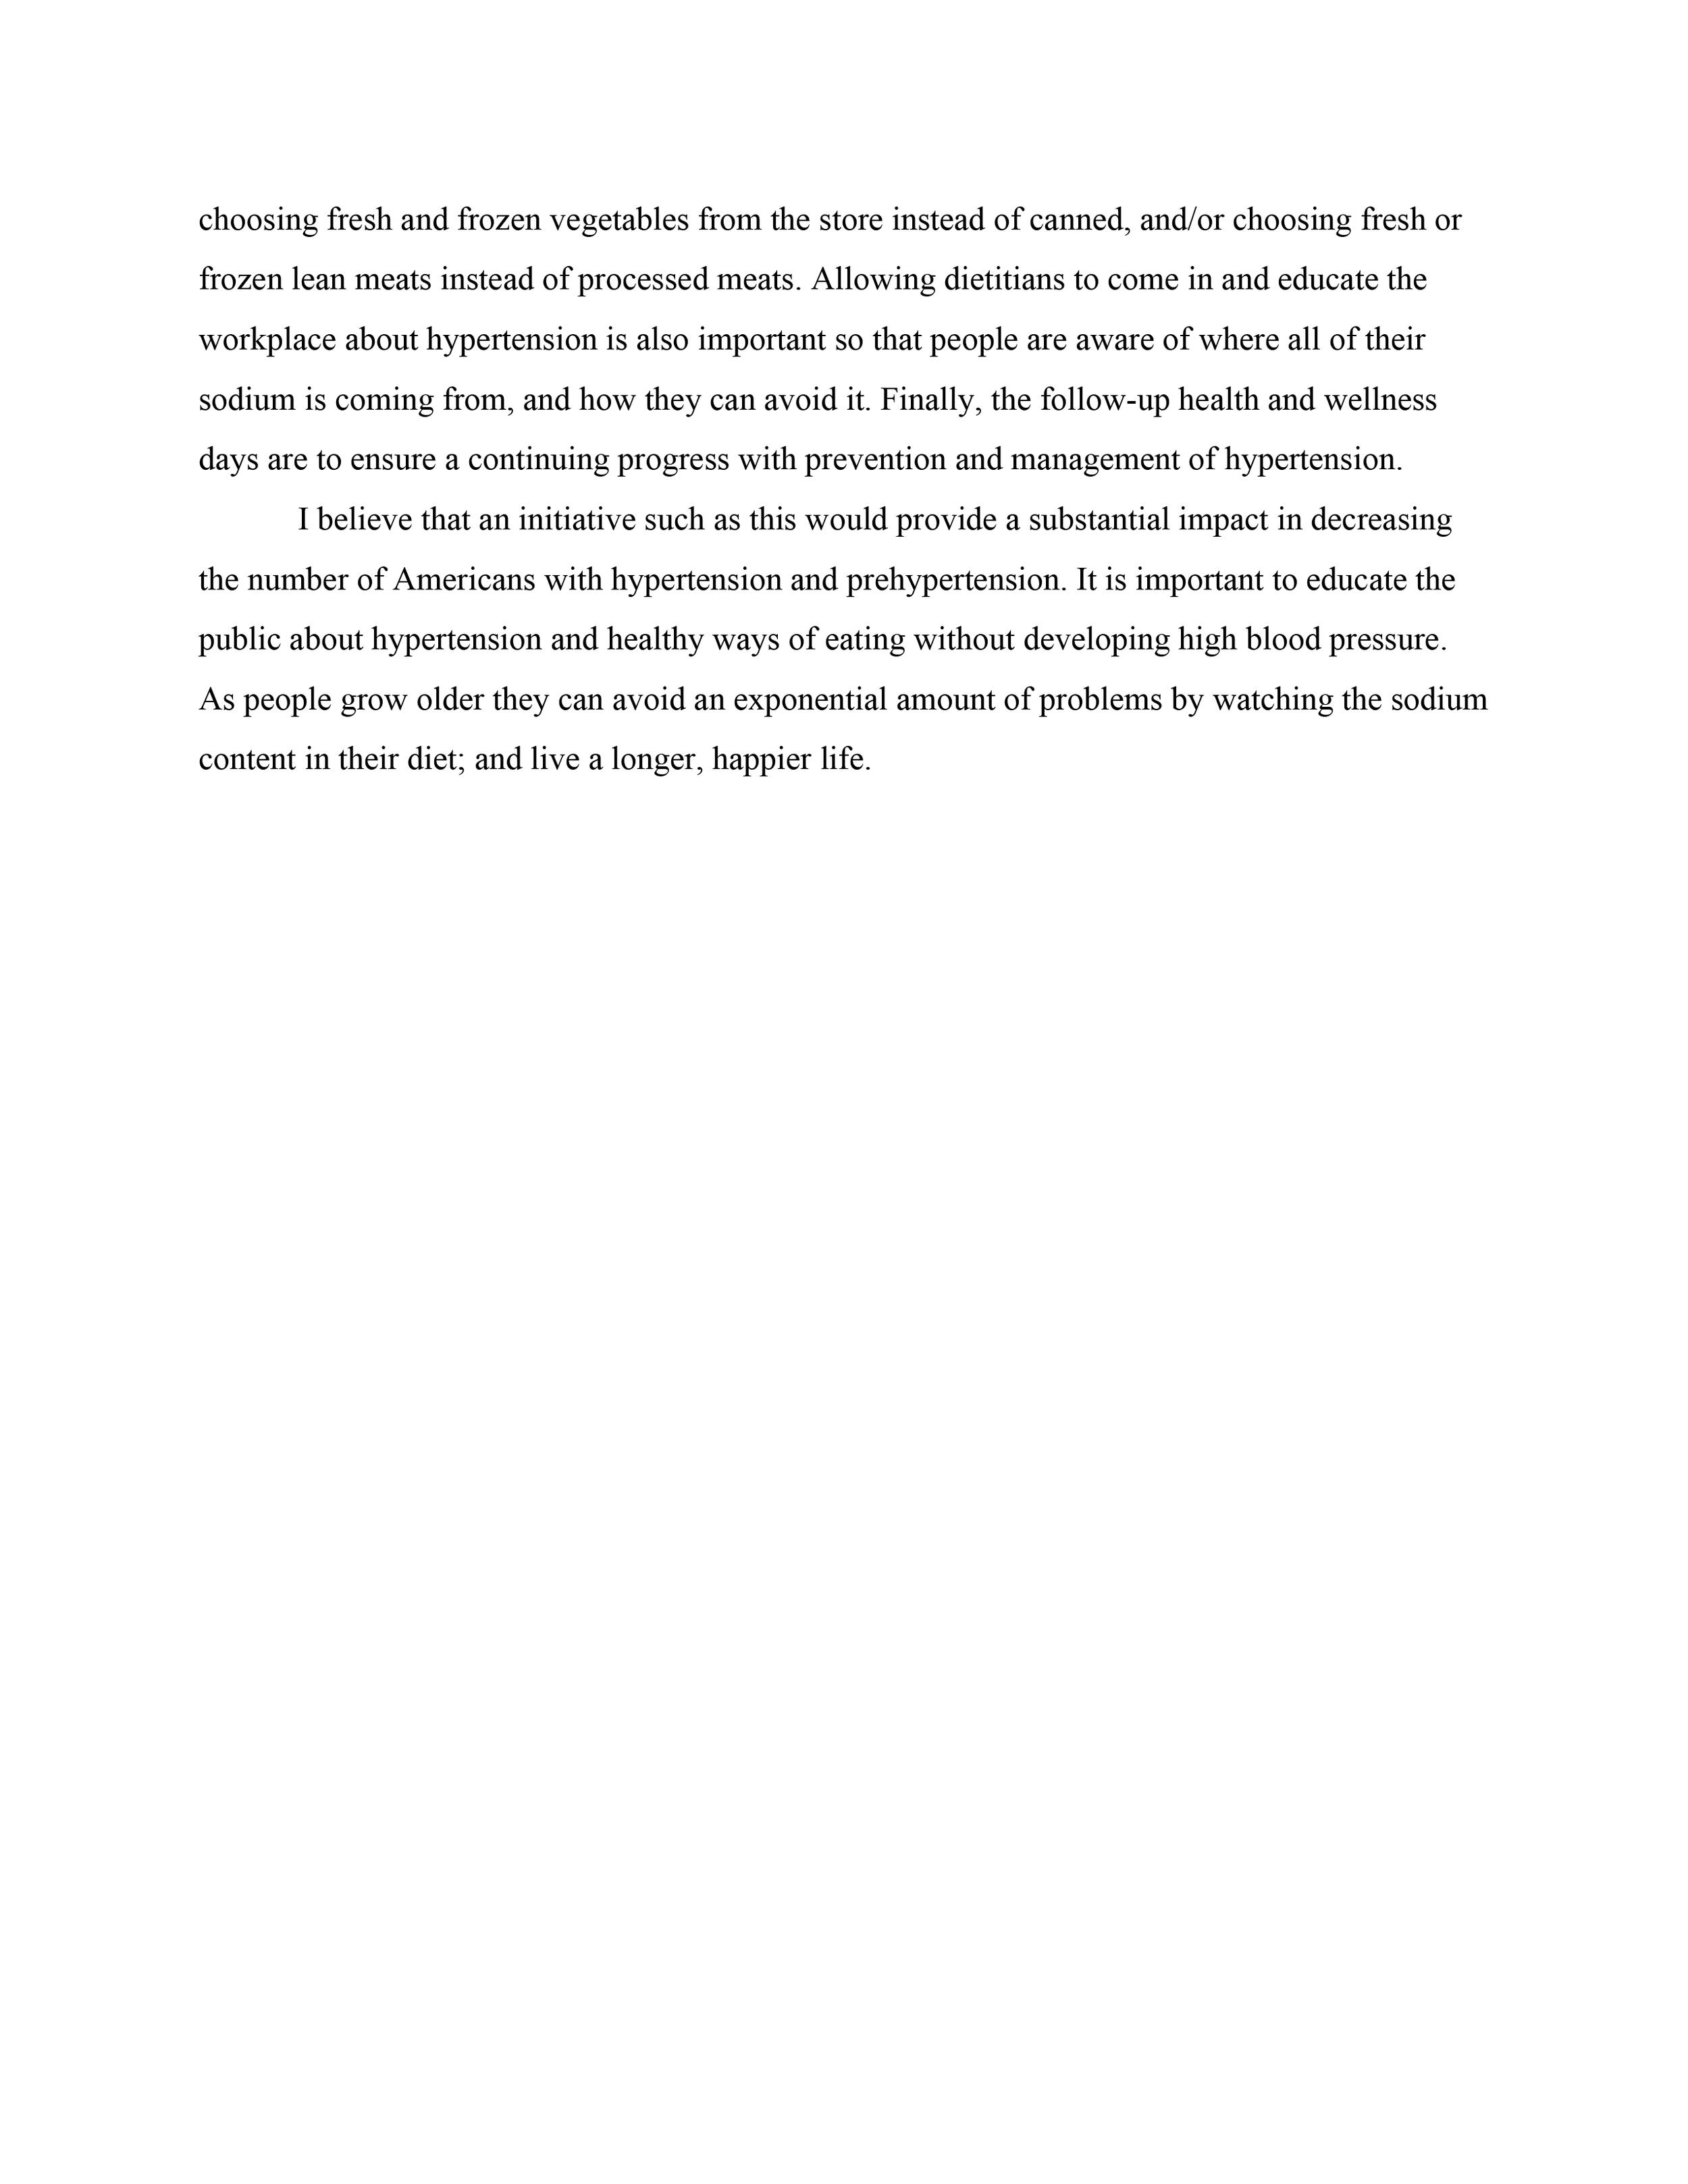 Natalie Olrich Essay, Page 2